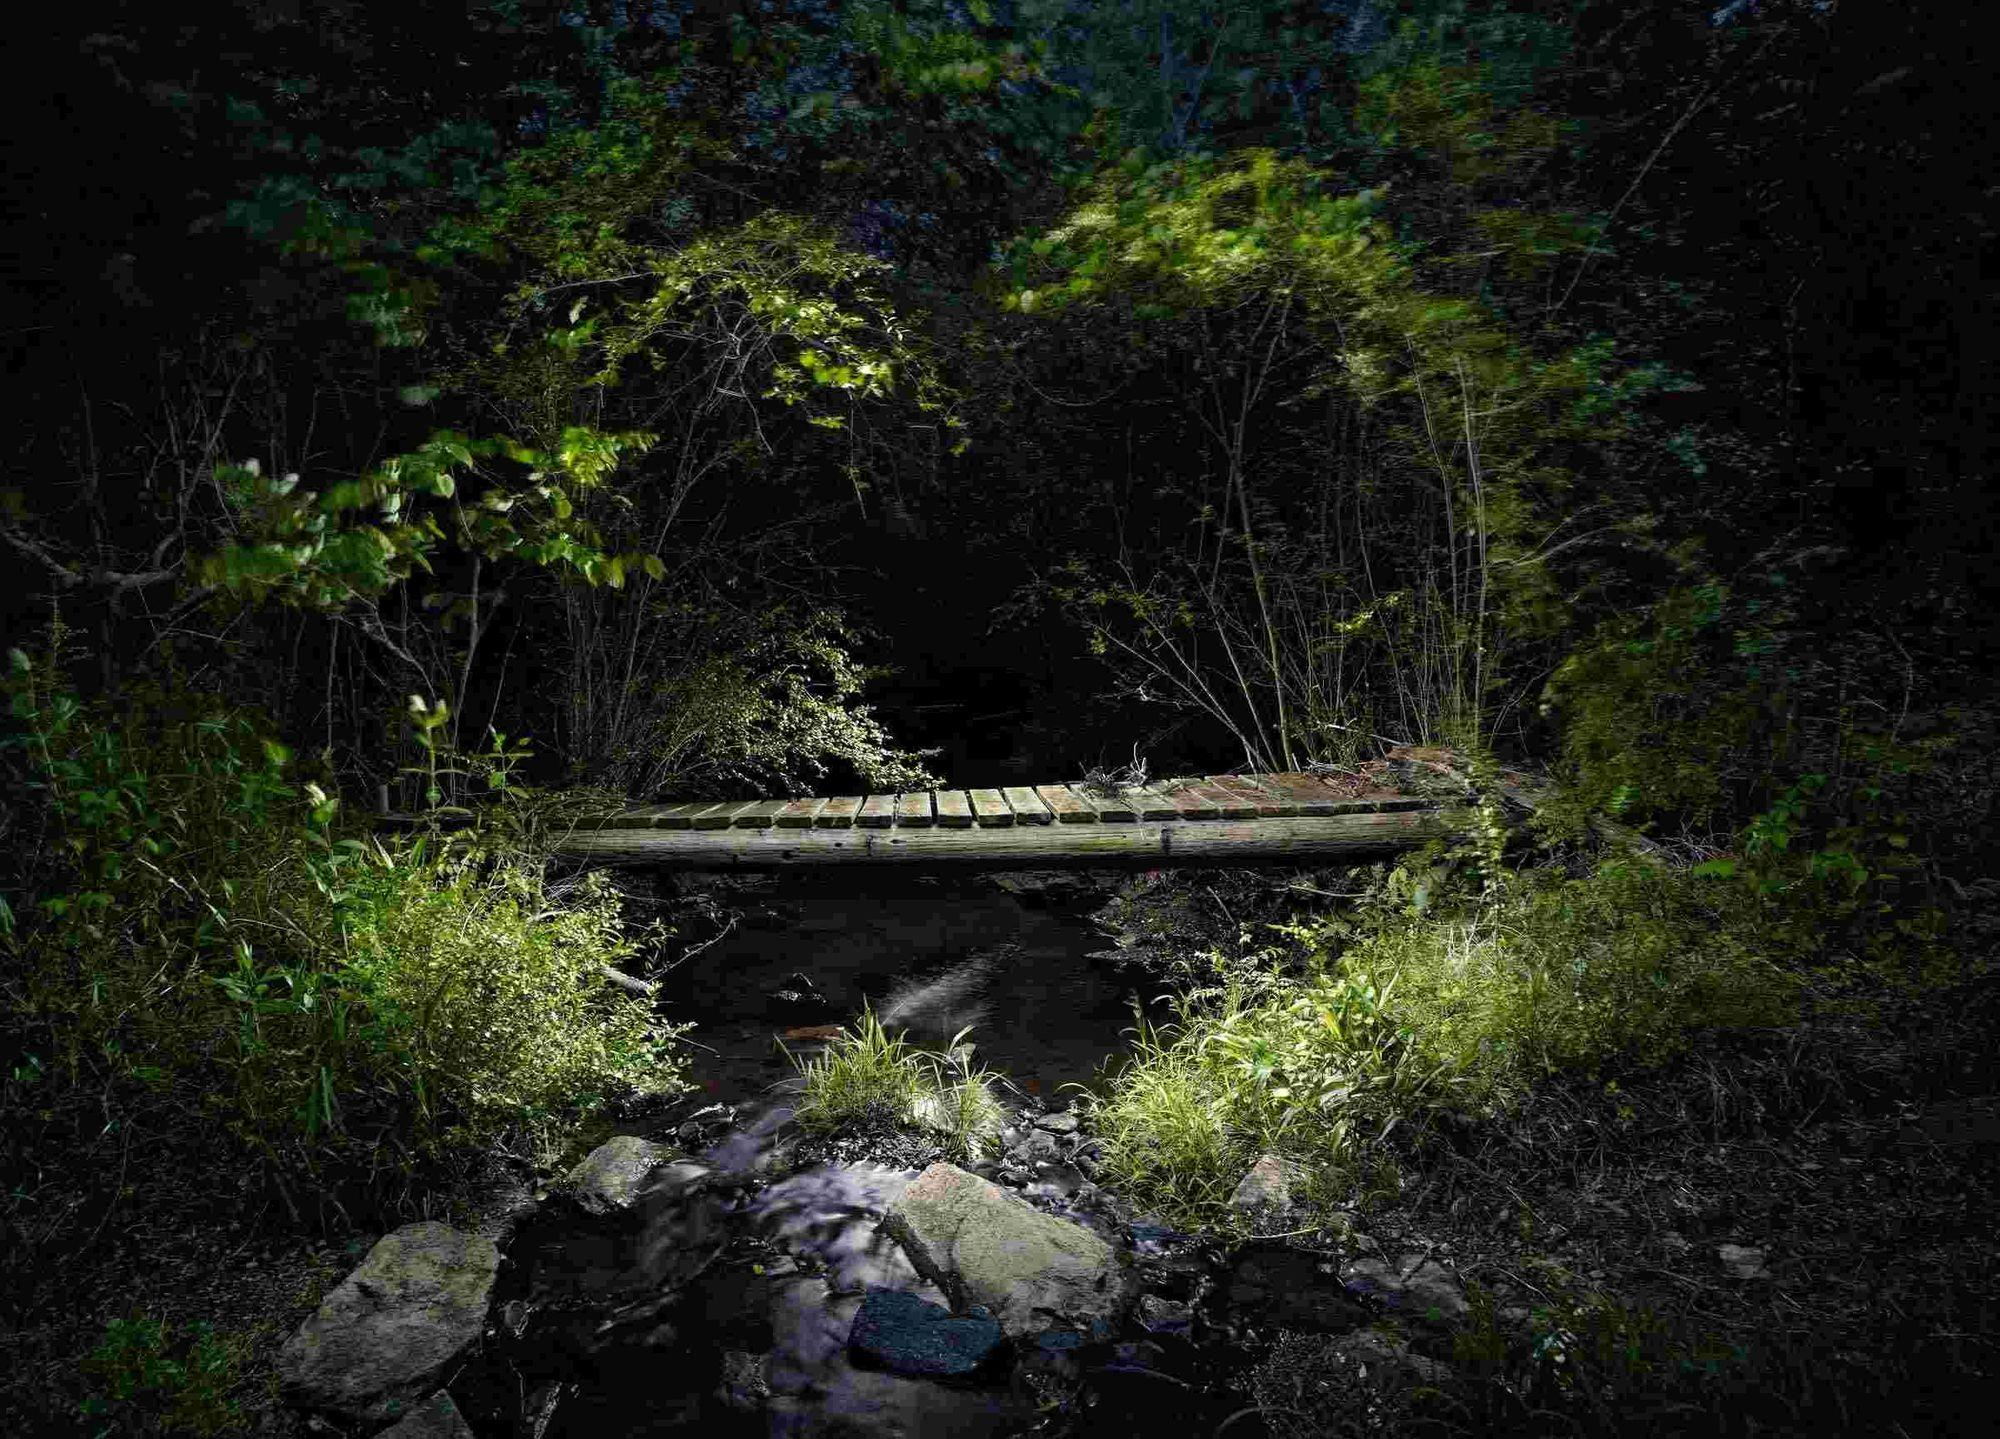 5_photo-2.jpg